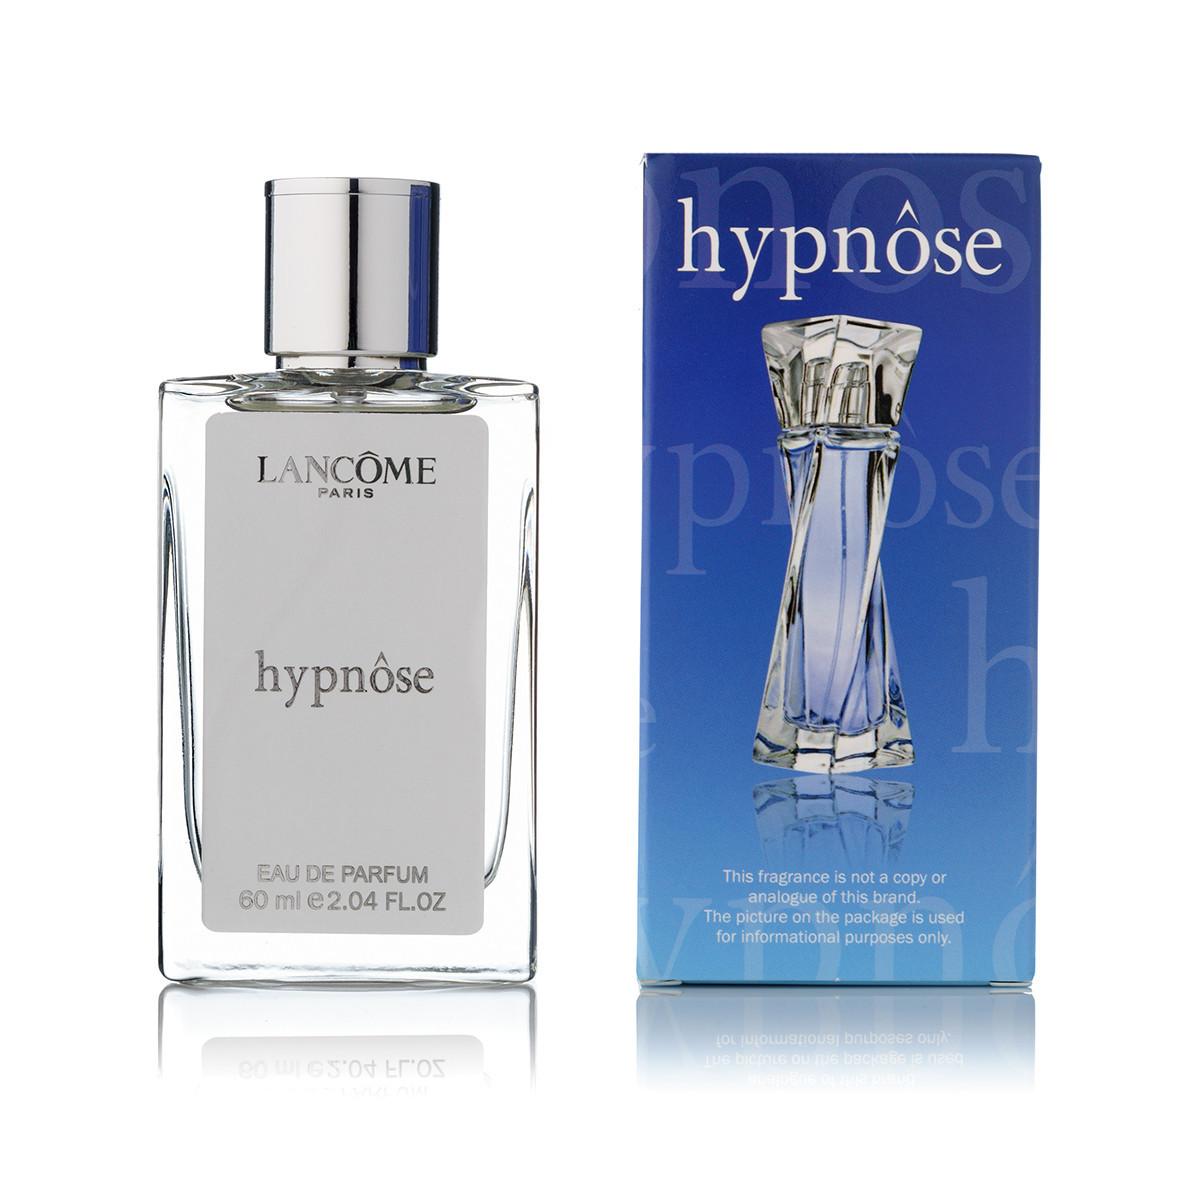 Женский парфюм Lancome Hypnose (ланком гипноз) тестер 60 ml в цветной упаковке  (реплика)